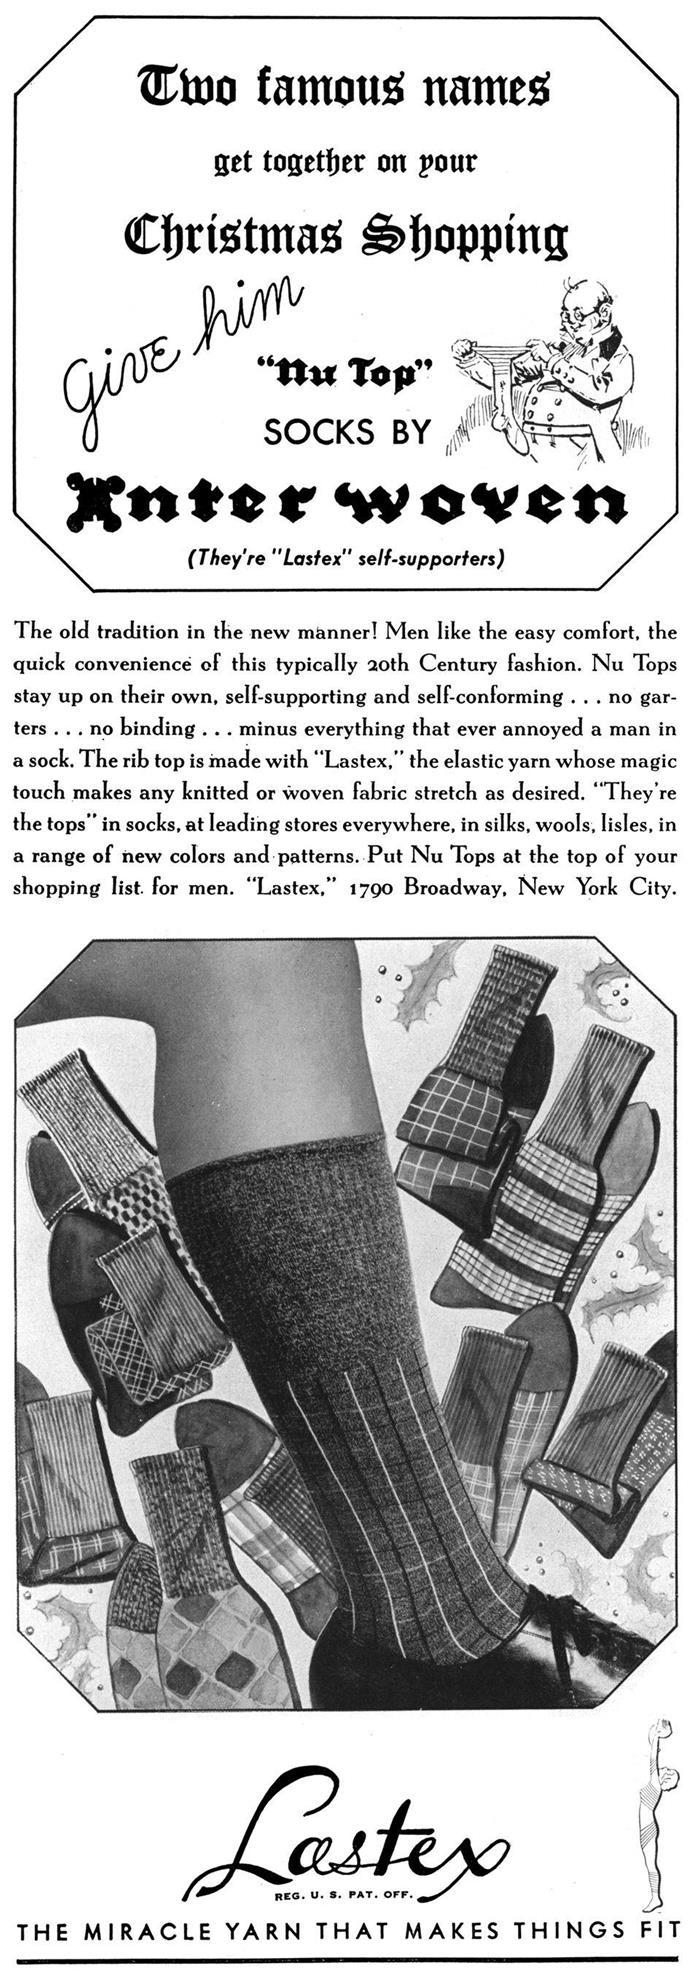 Esquire 1 декабря 1936 года. Реклама носков с ластексом